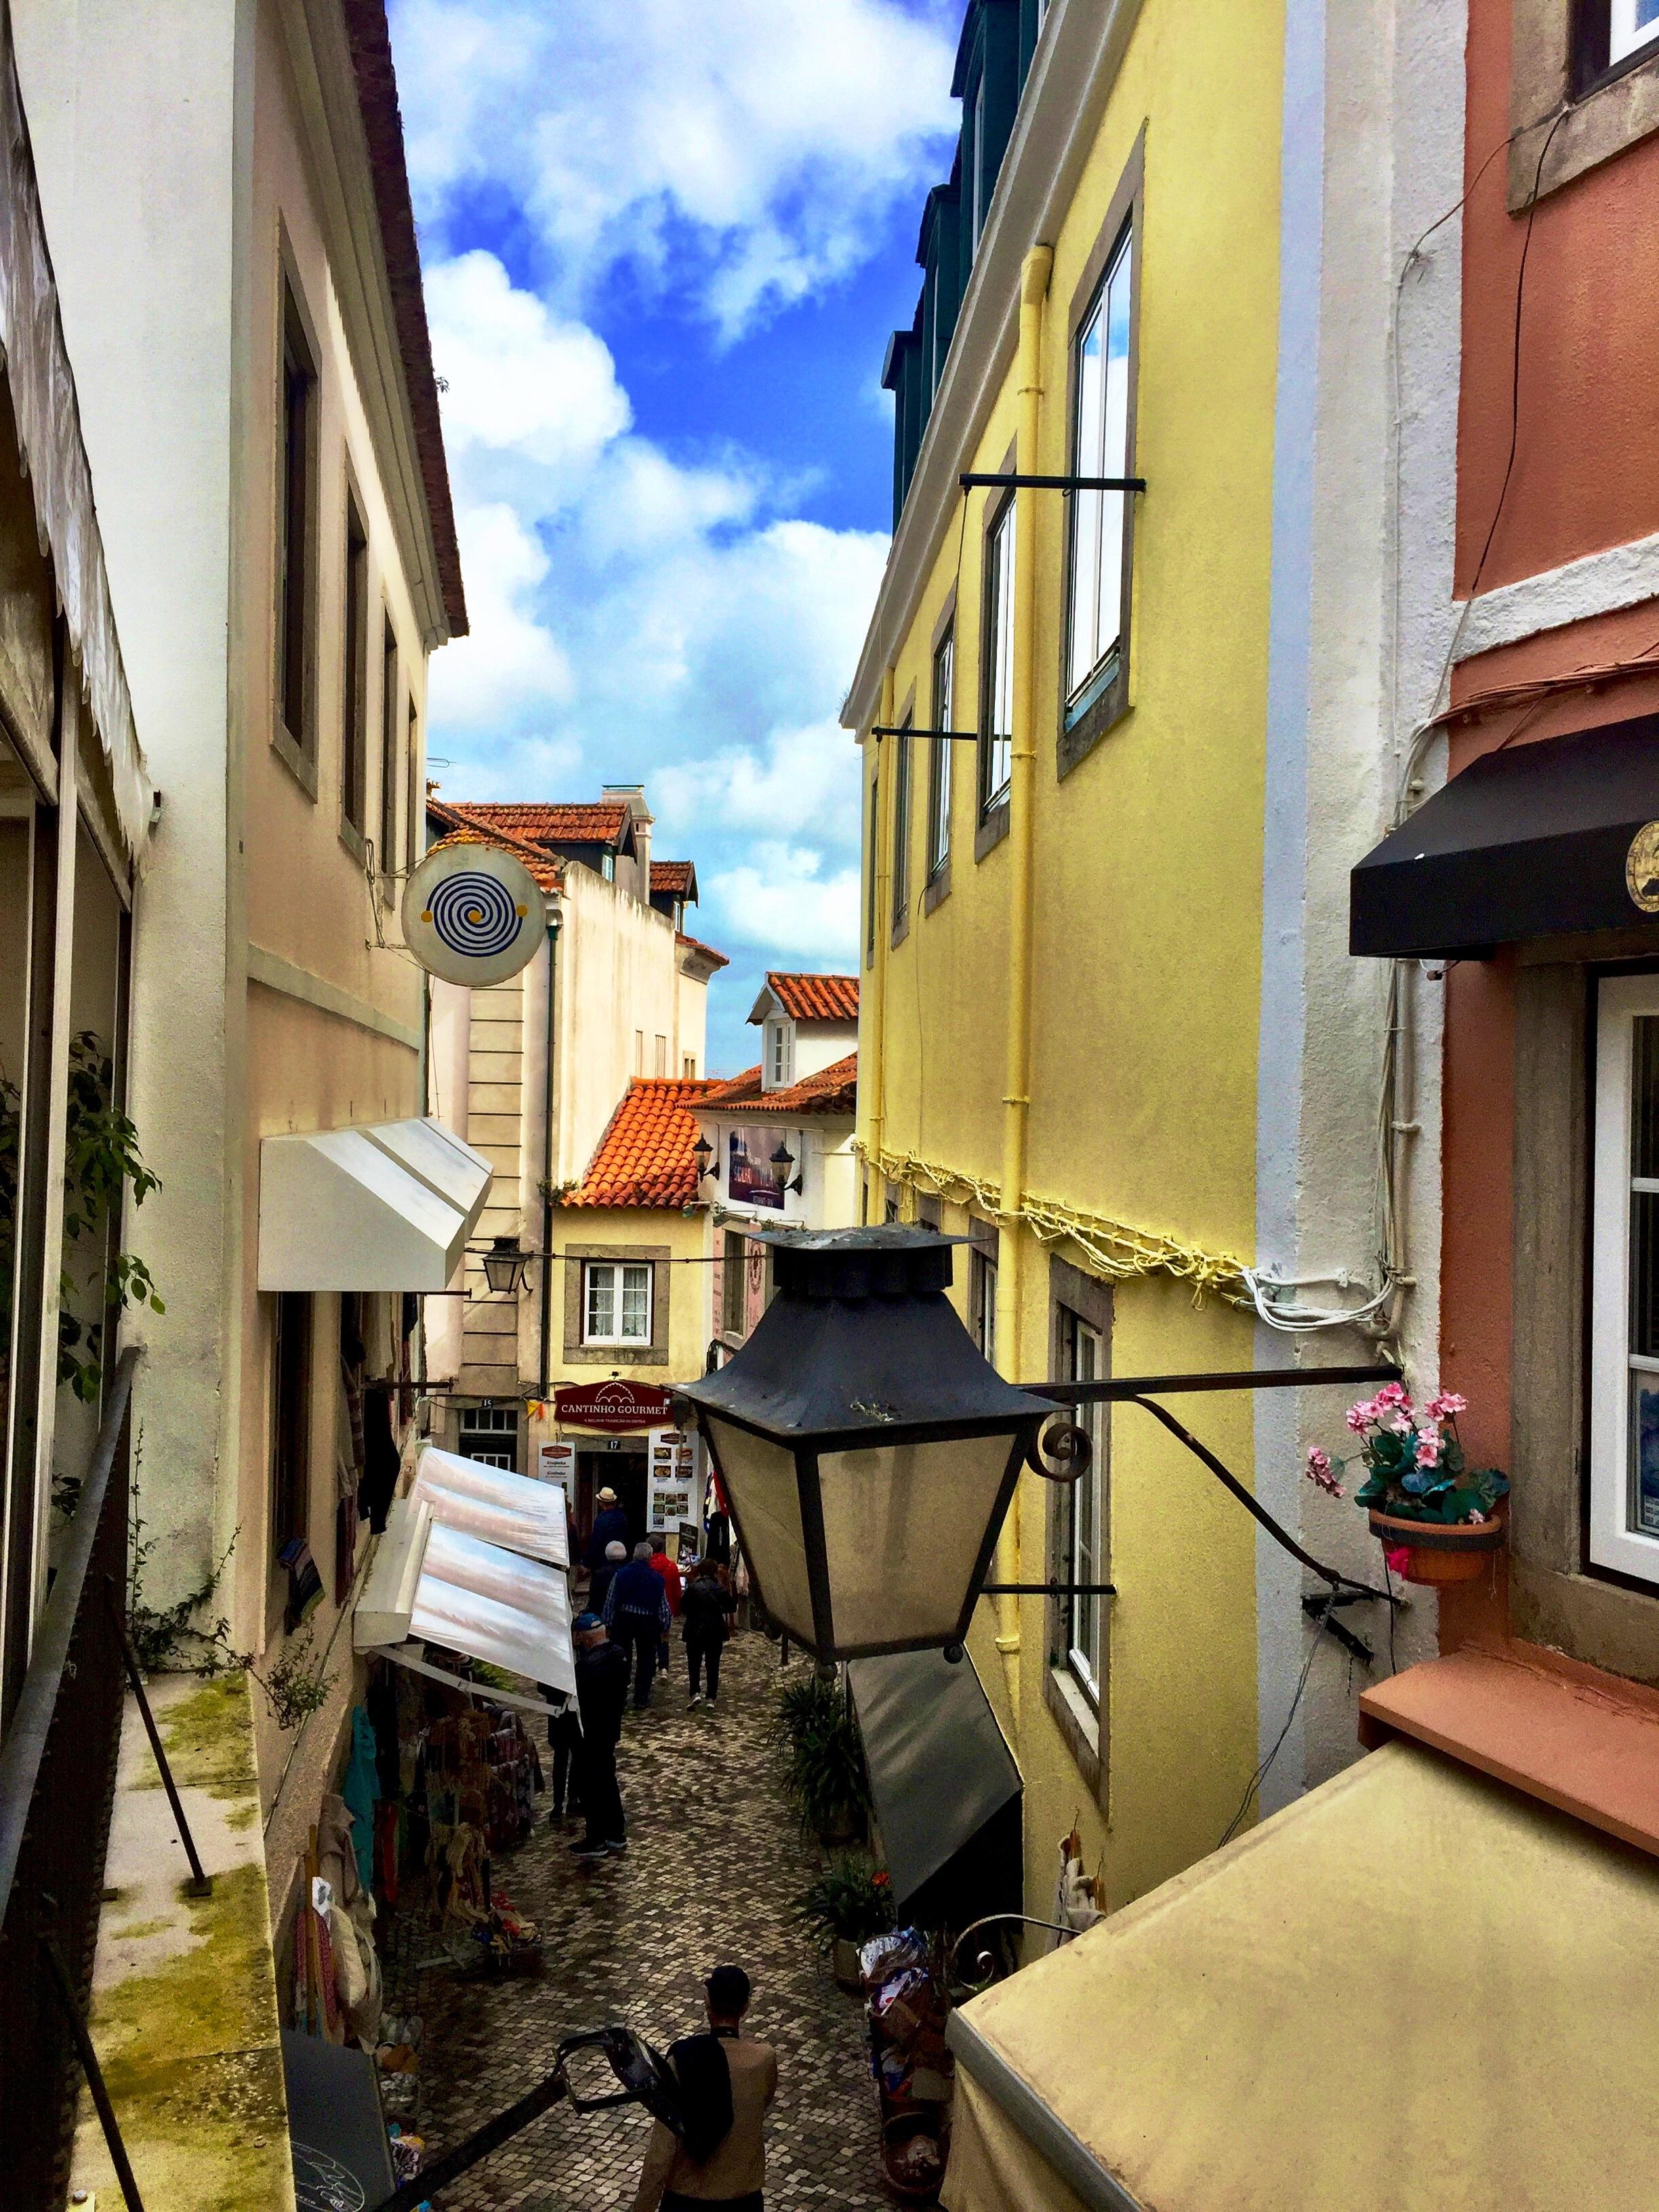 Cascais (Lisbon) - Sintra - Alentejo